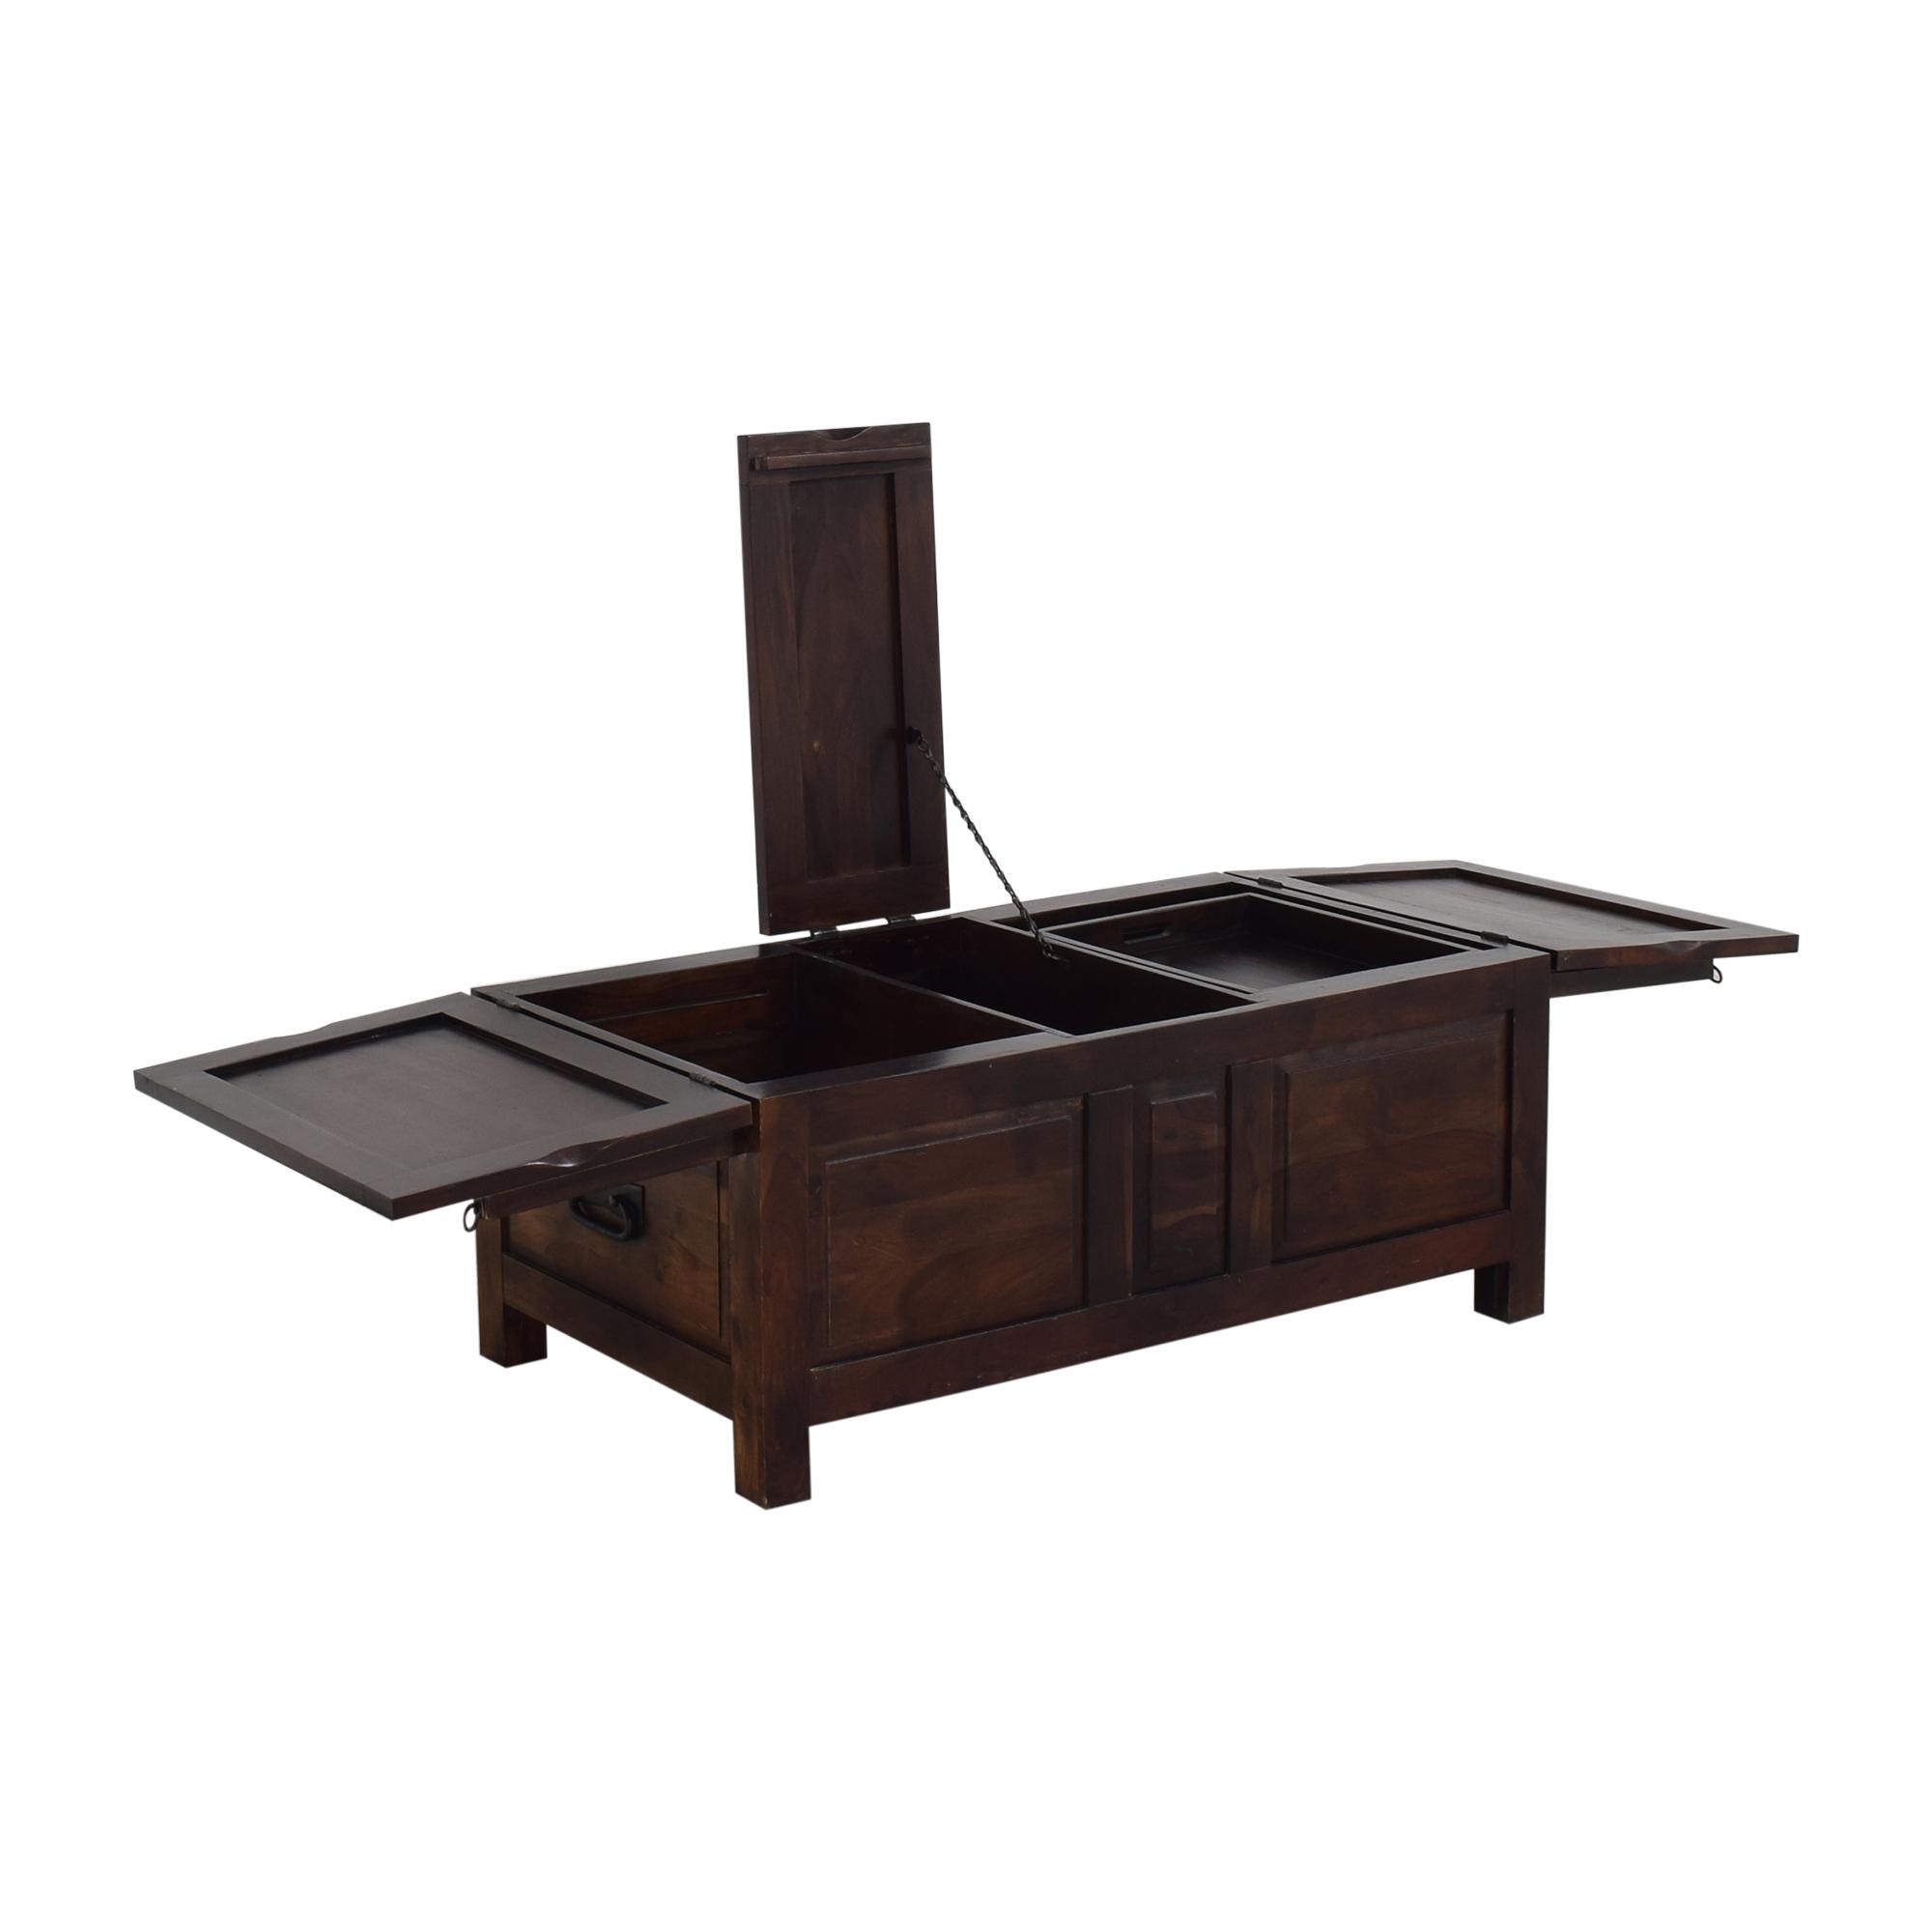 Crate & Barrel Hunter II Trunk Storage Coffee Table / Trunks